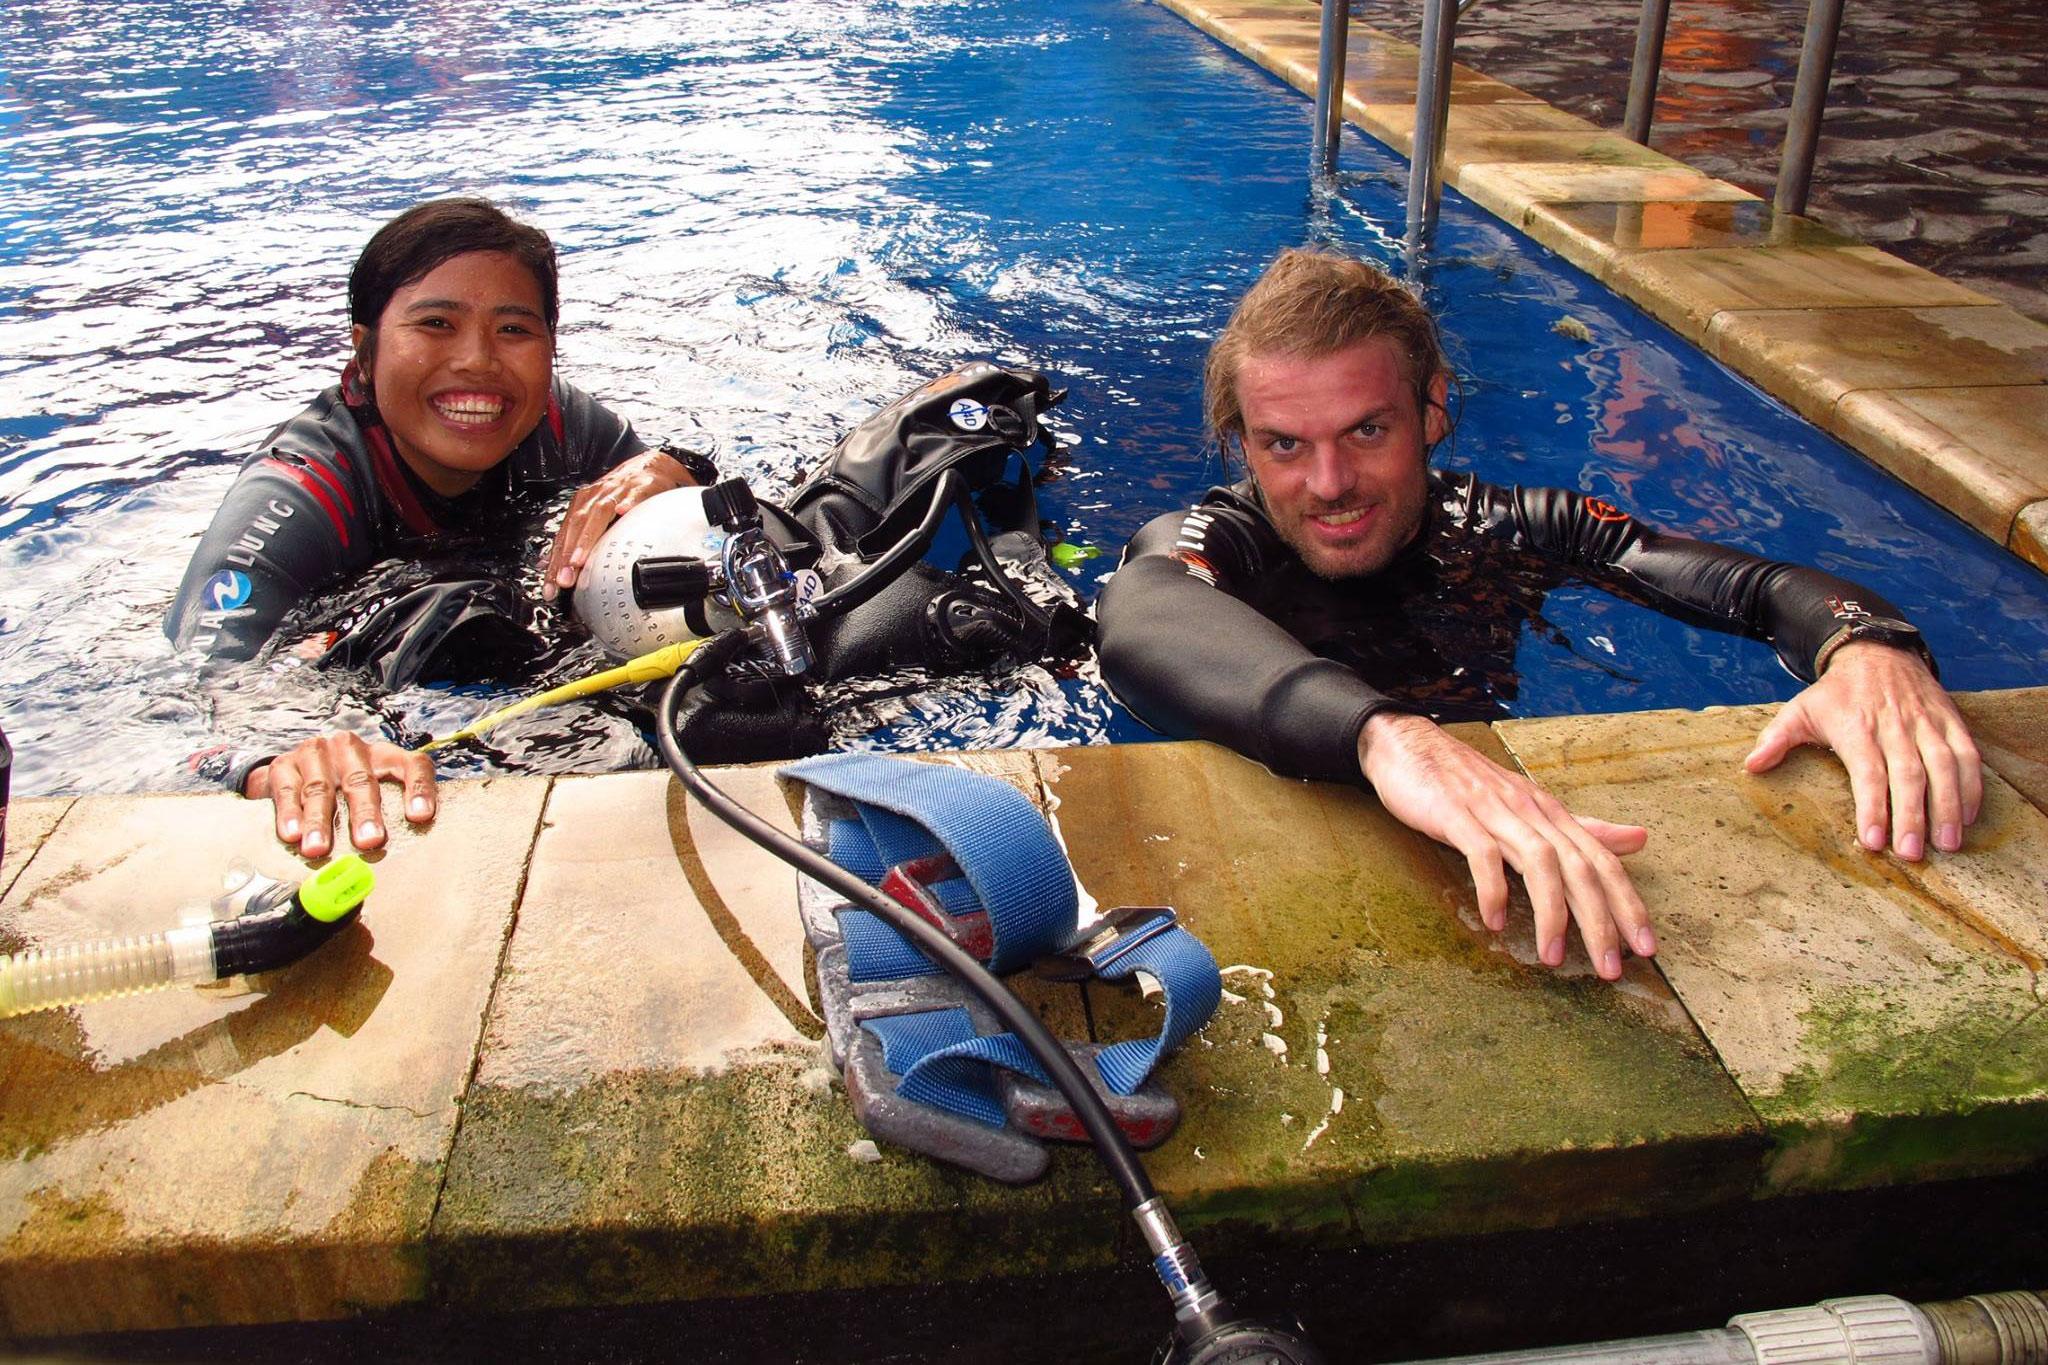 Scuba Diver Pool Training